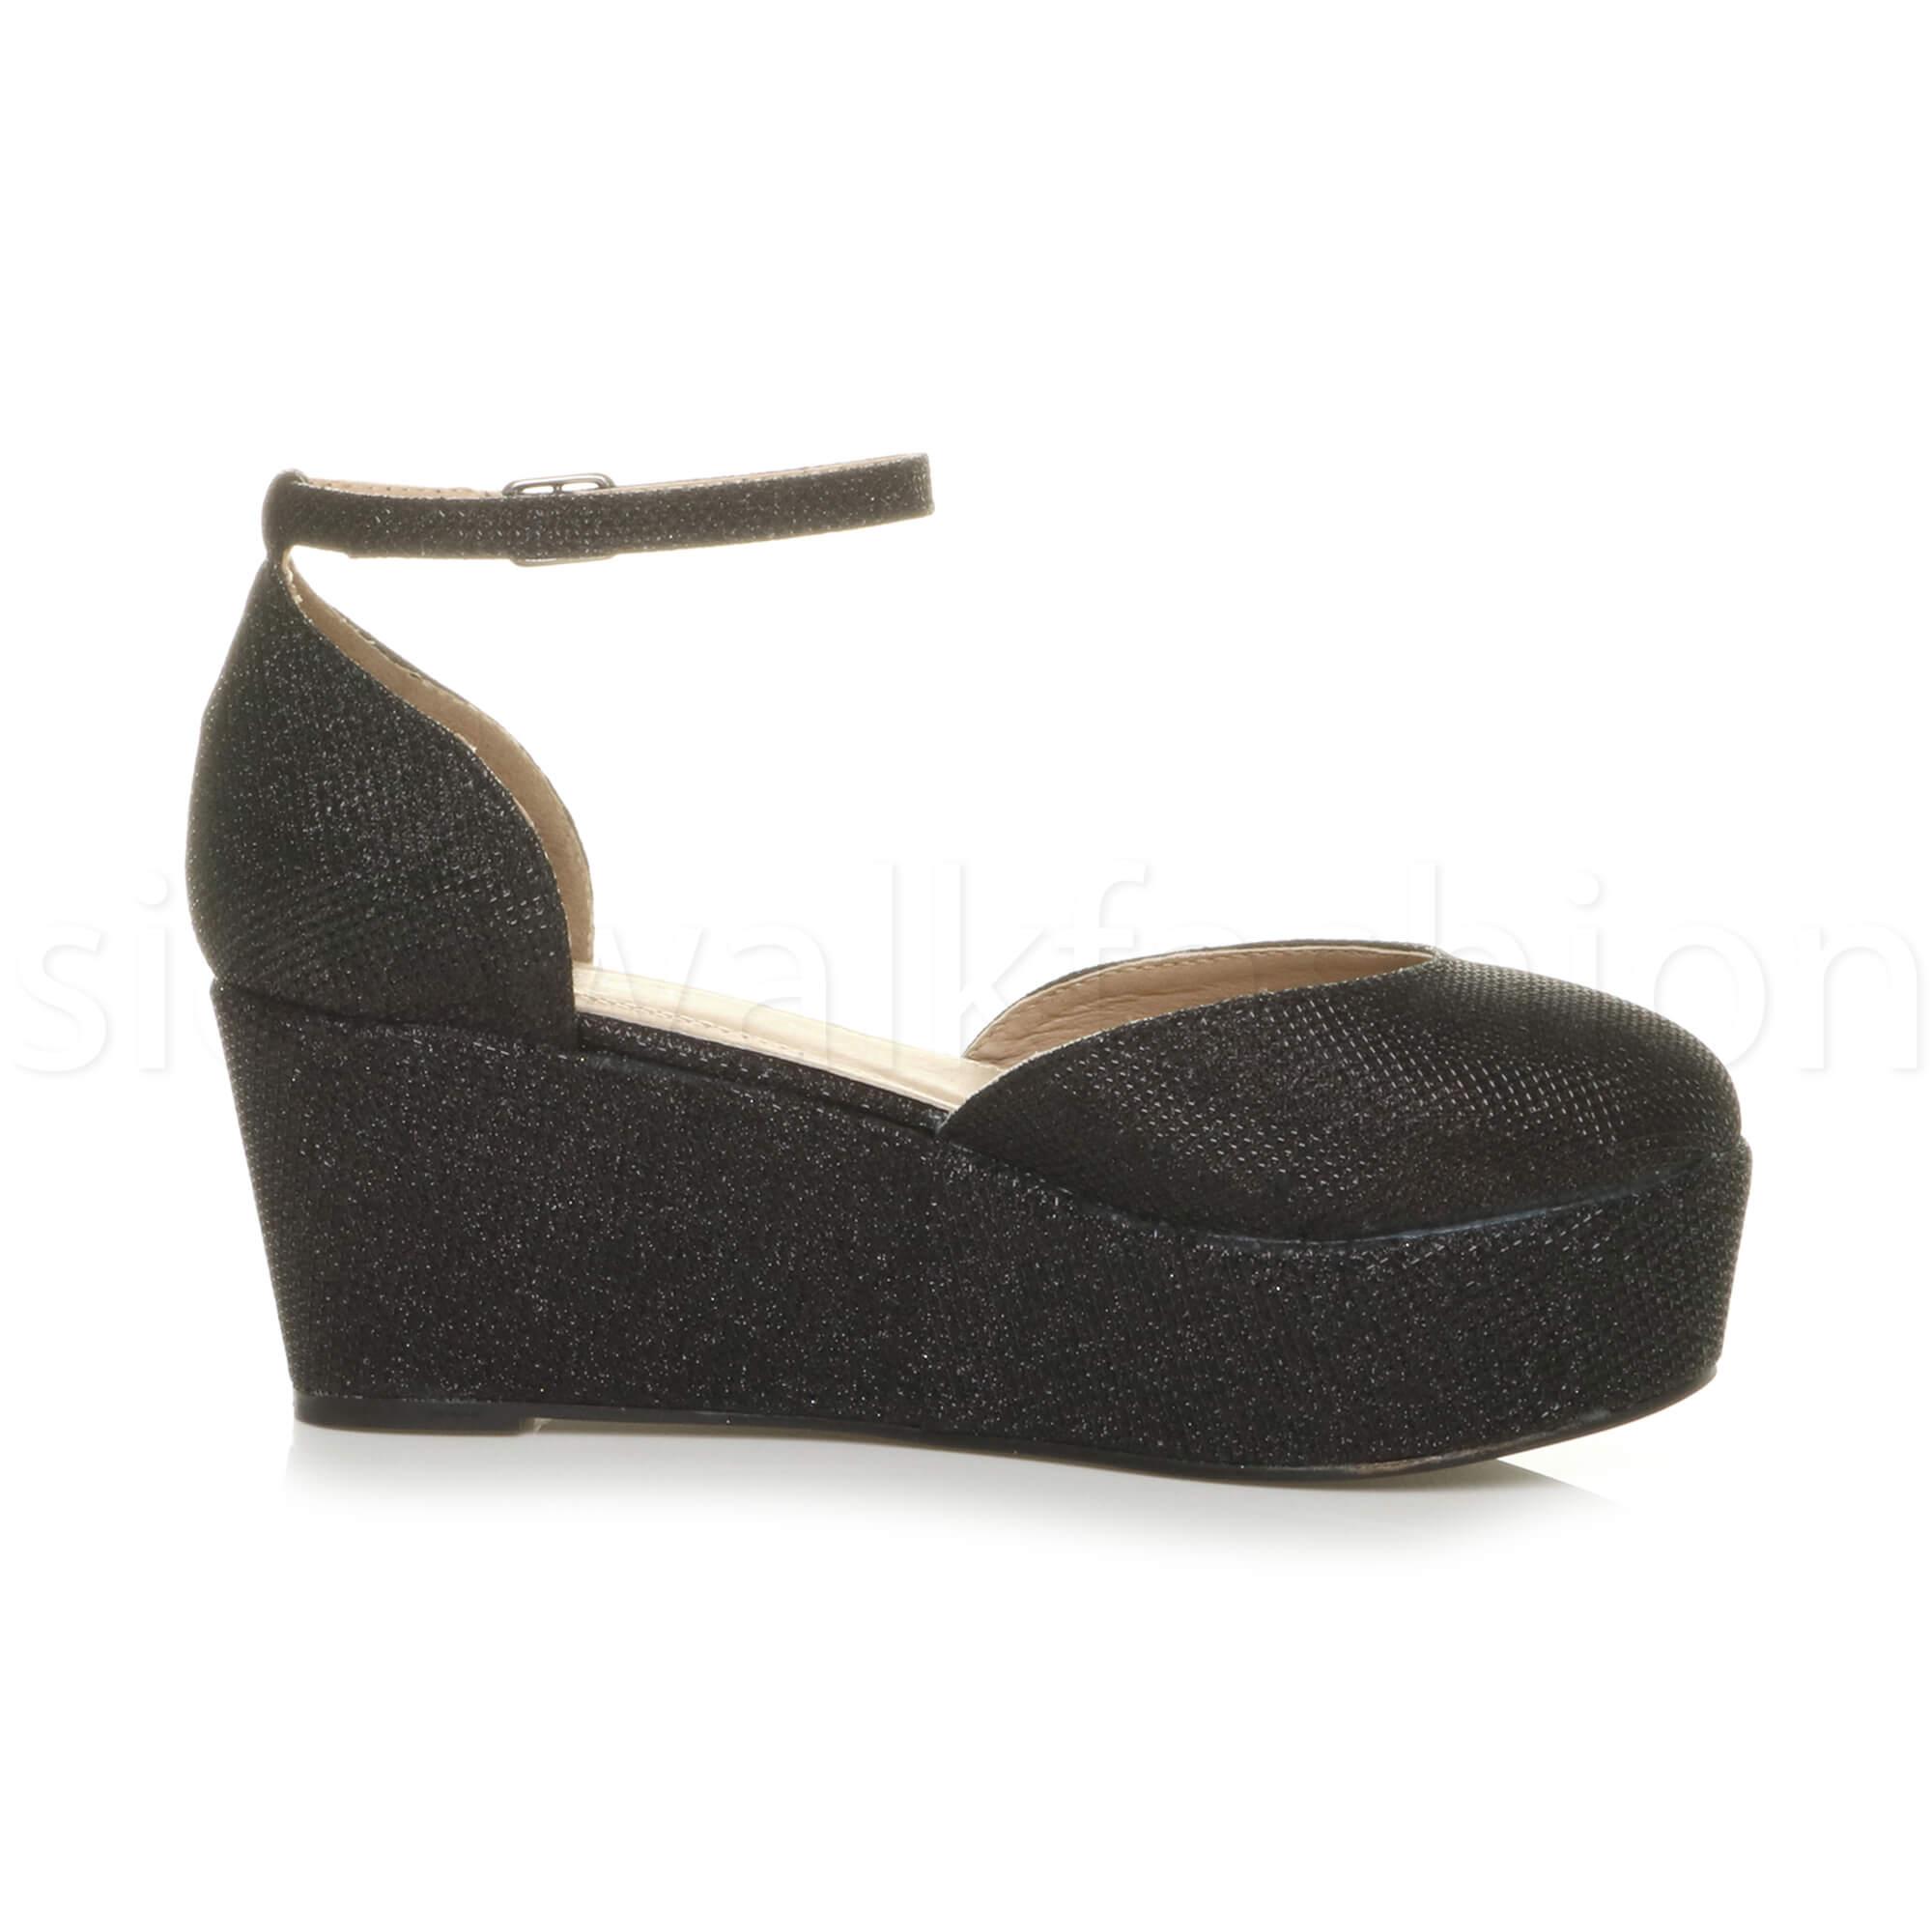 Womens-ladies-flatform-mid-wedge-ankle-strap-platform-court-shoes-sandals-size thumbnail 4